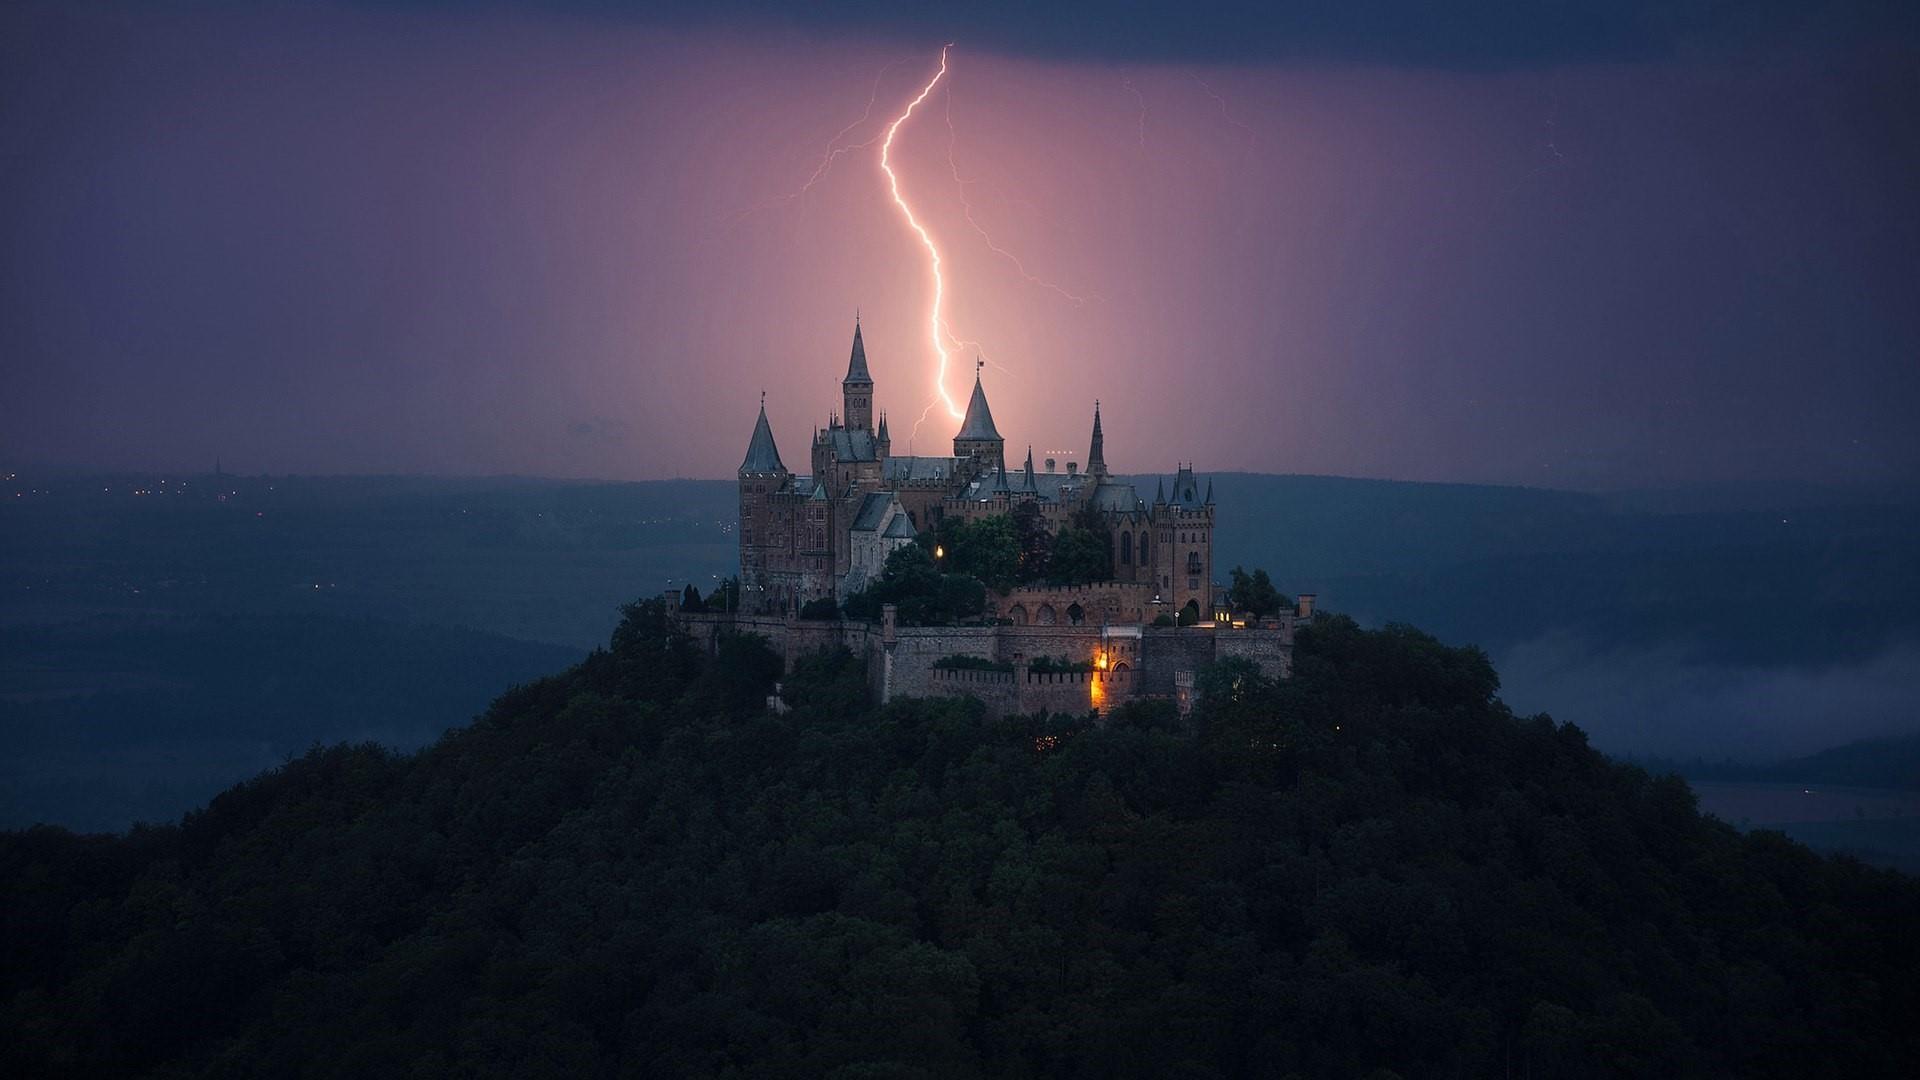 Hohenzollern Castle with lightning strike wallpaper